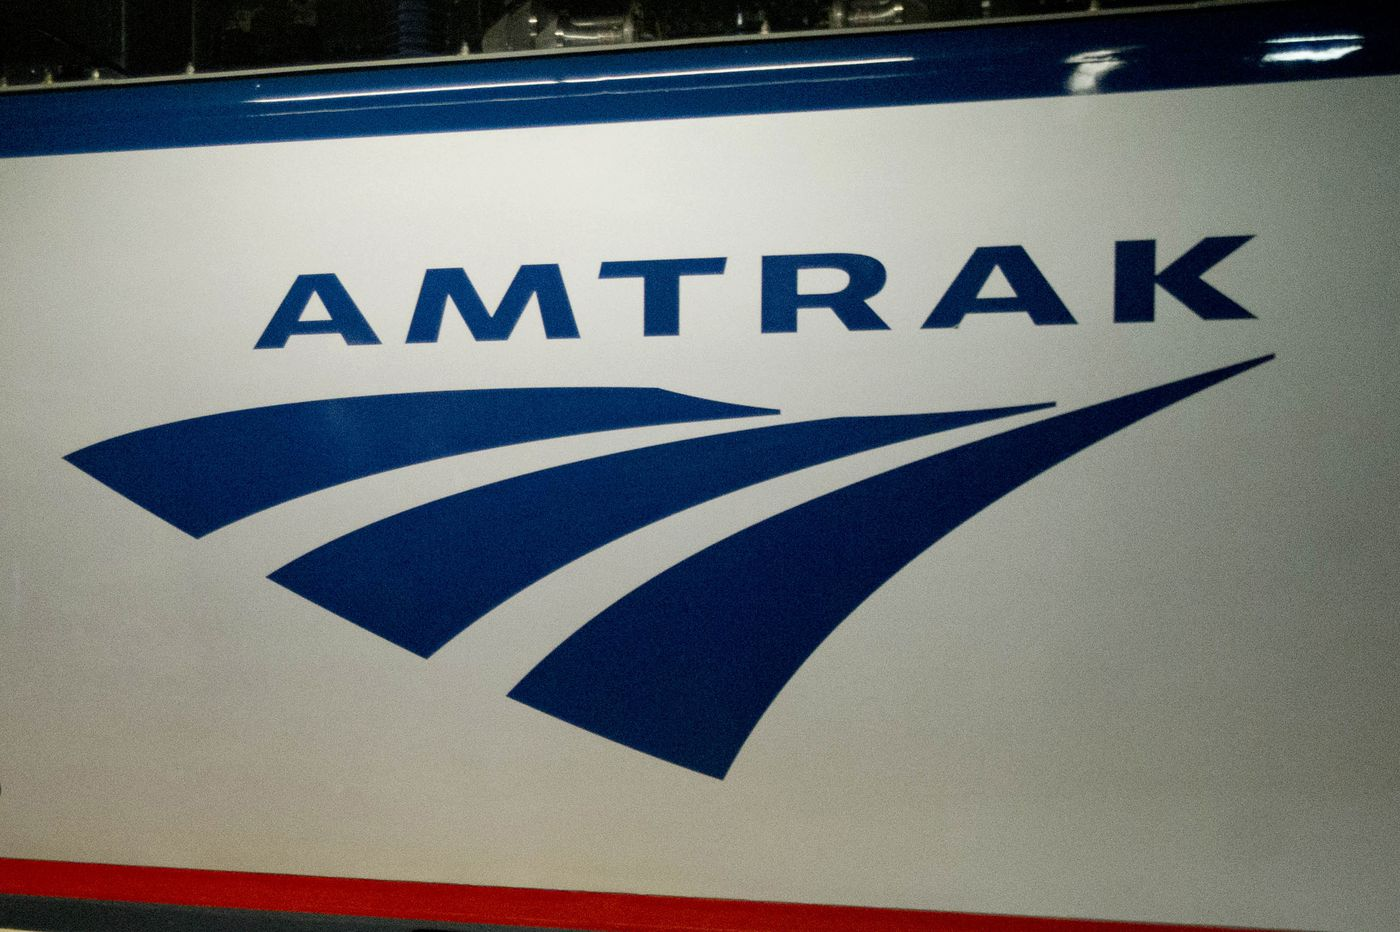 Person struck by Amtrak train in Bucks County